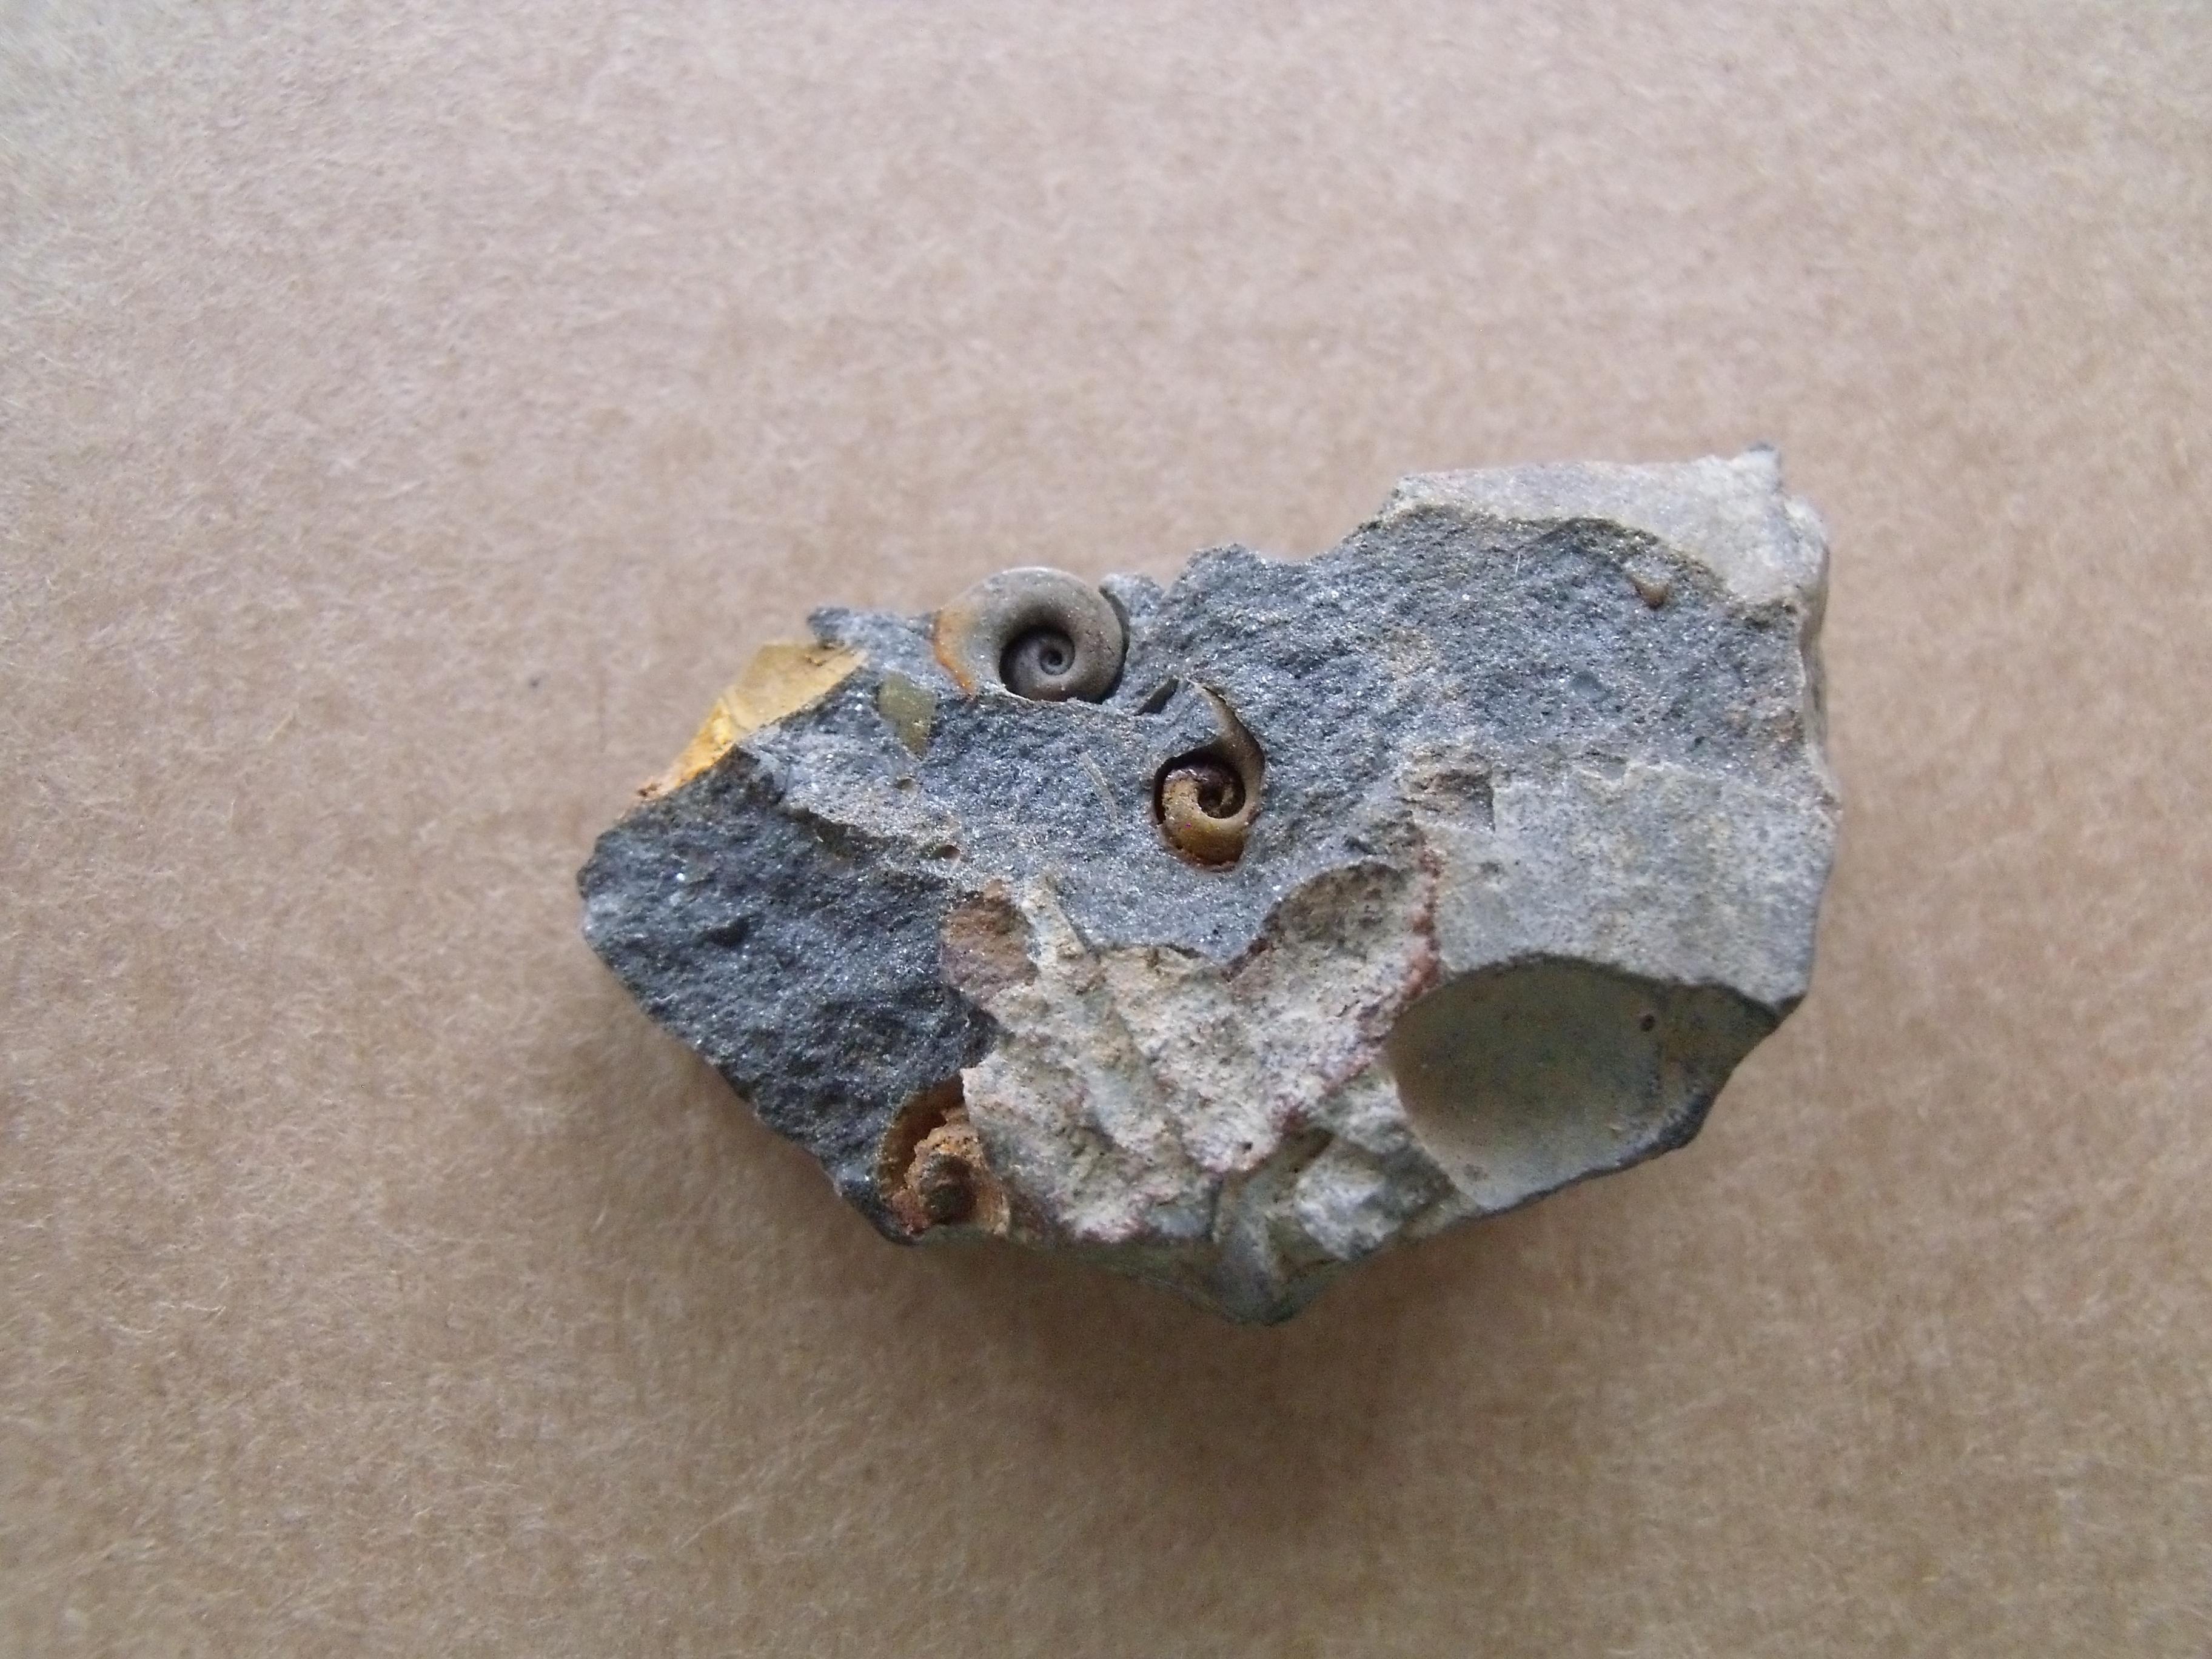 plži Tropidodiscus pusillus, (lok.Těškov)